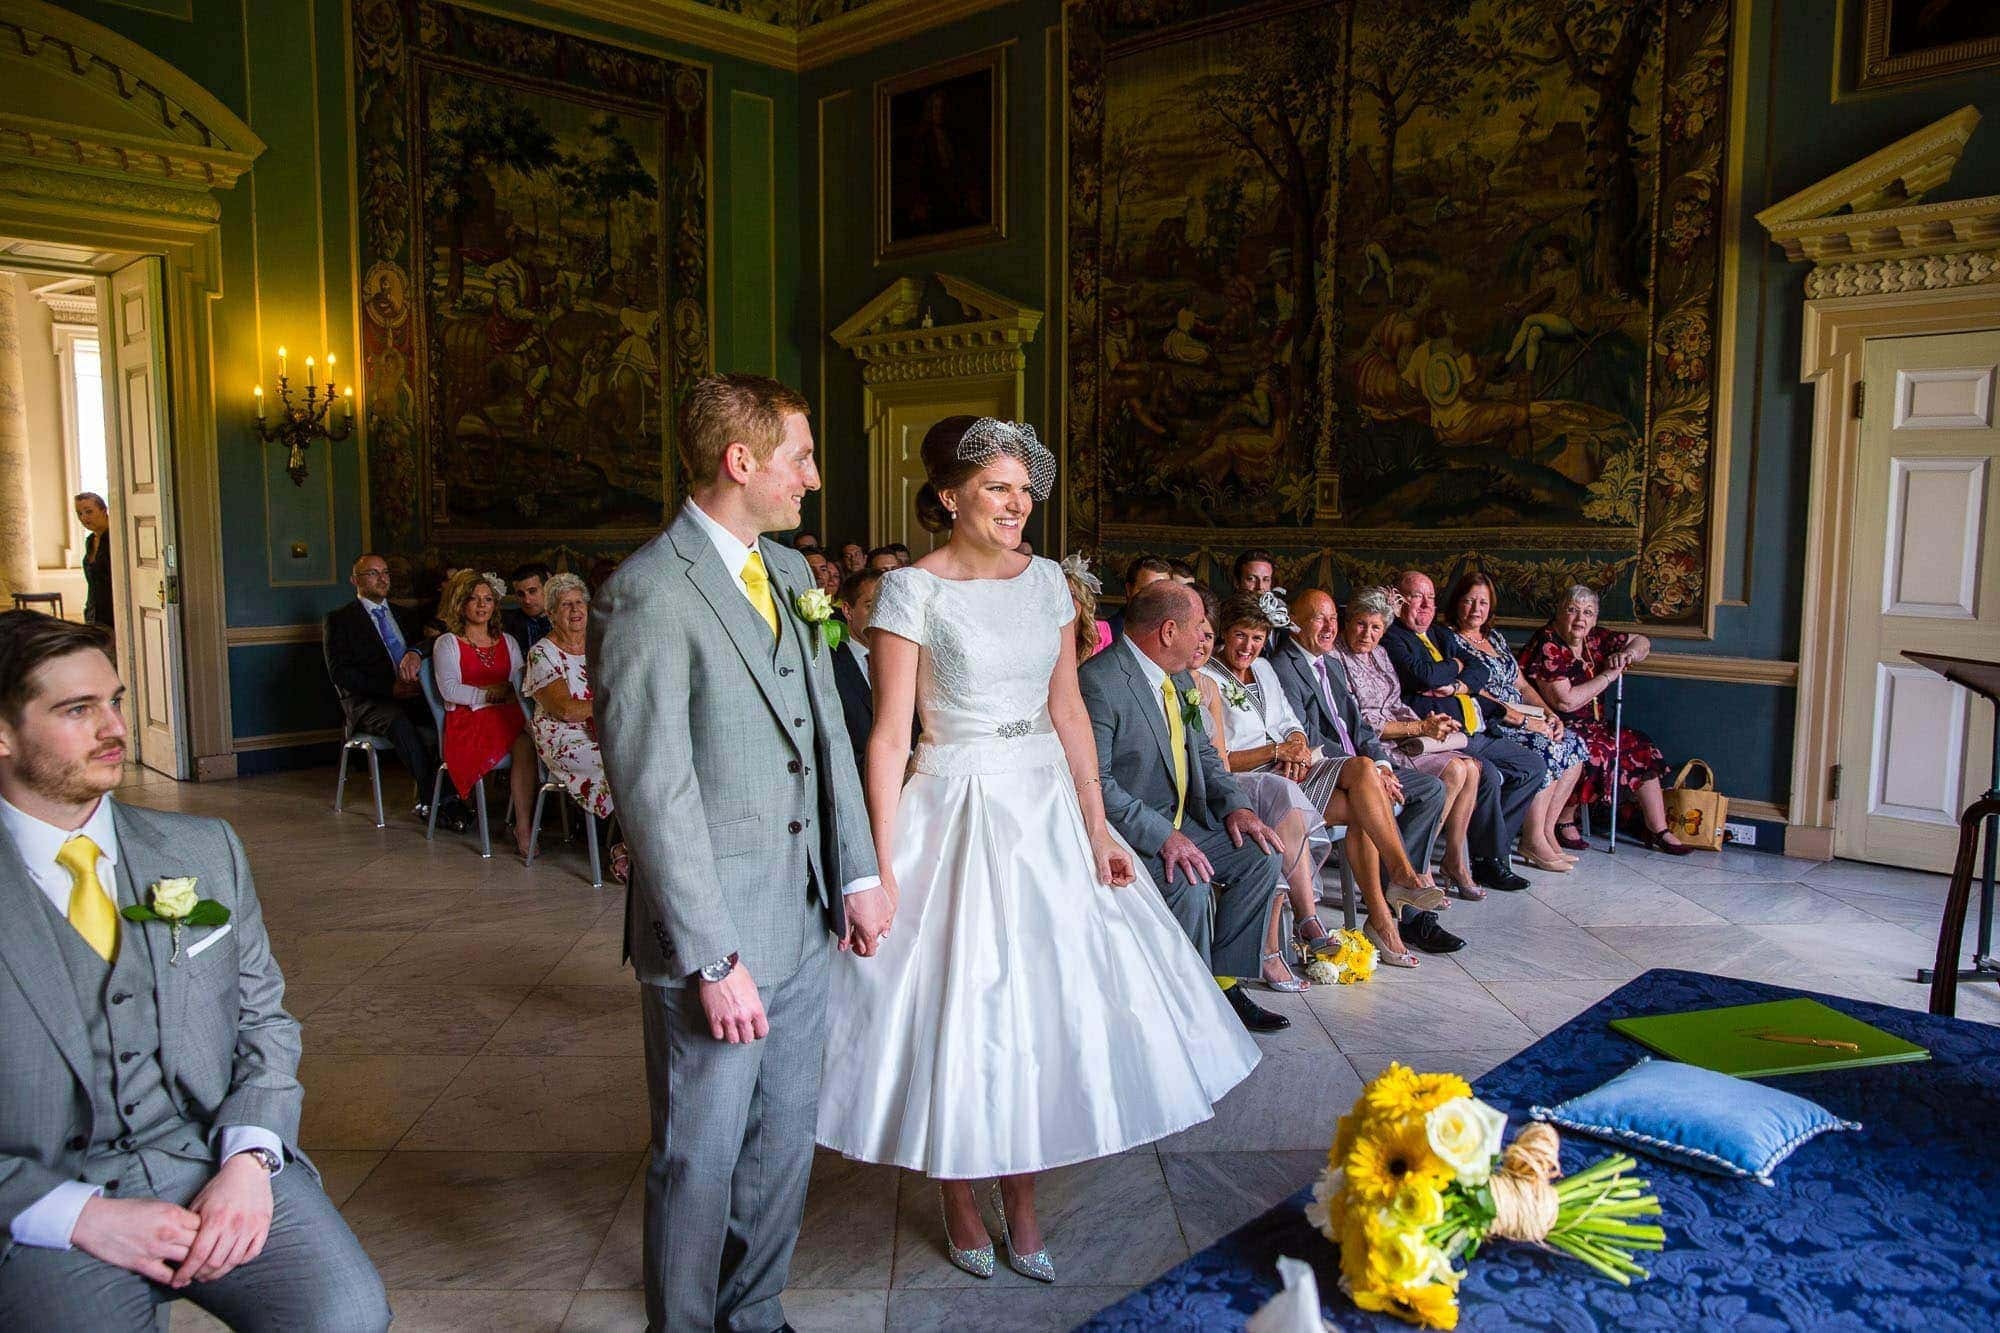 Clandon Park Wedding Photographer 42 5493